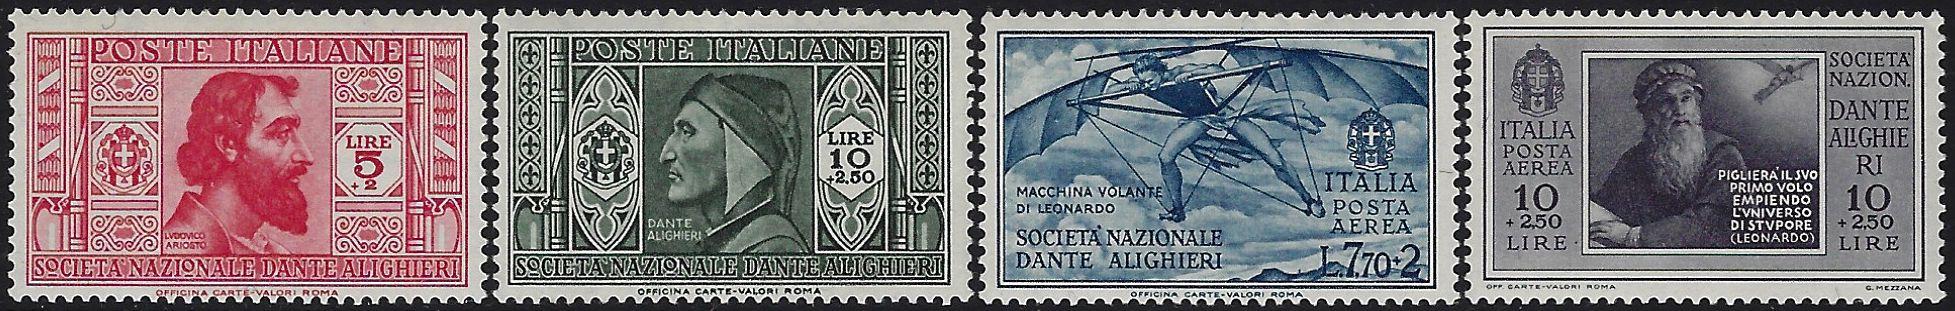 1932 Dante Alighieri MNH